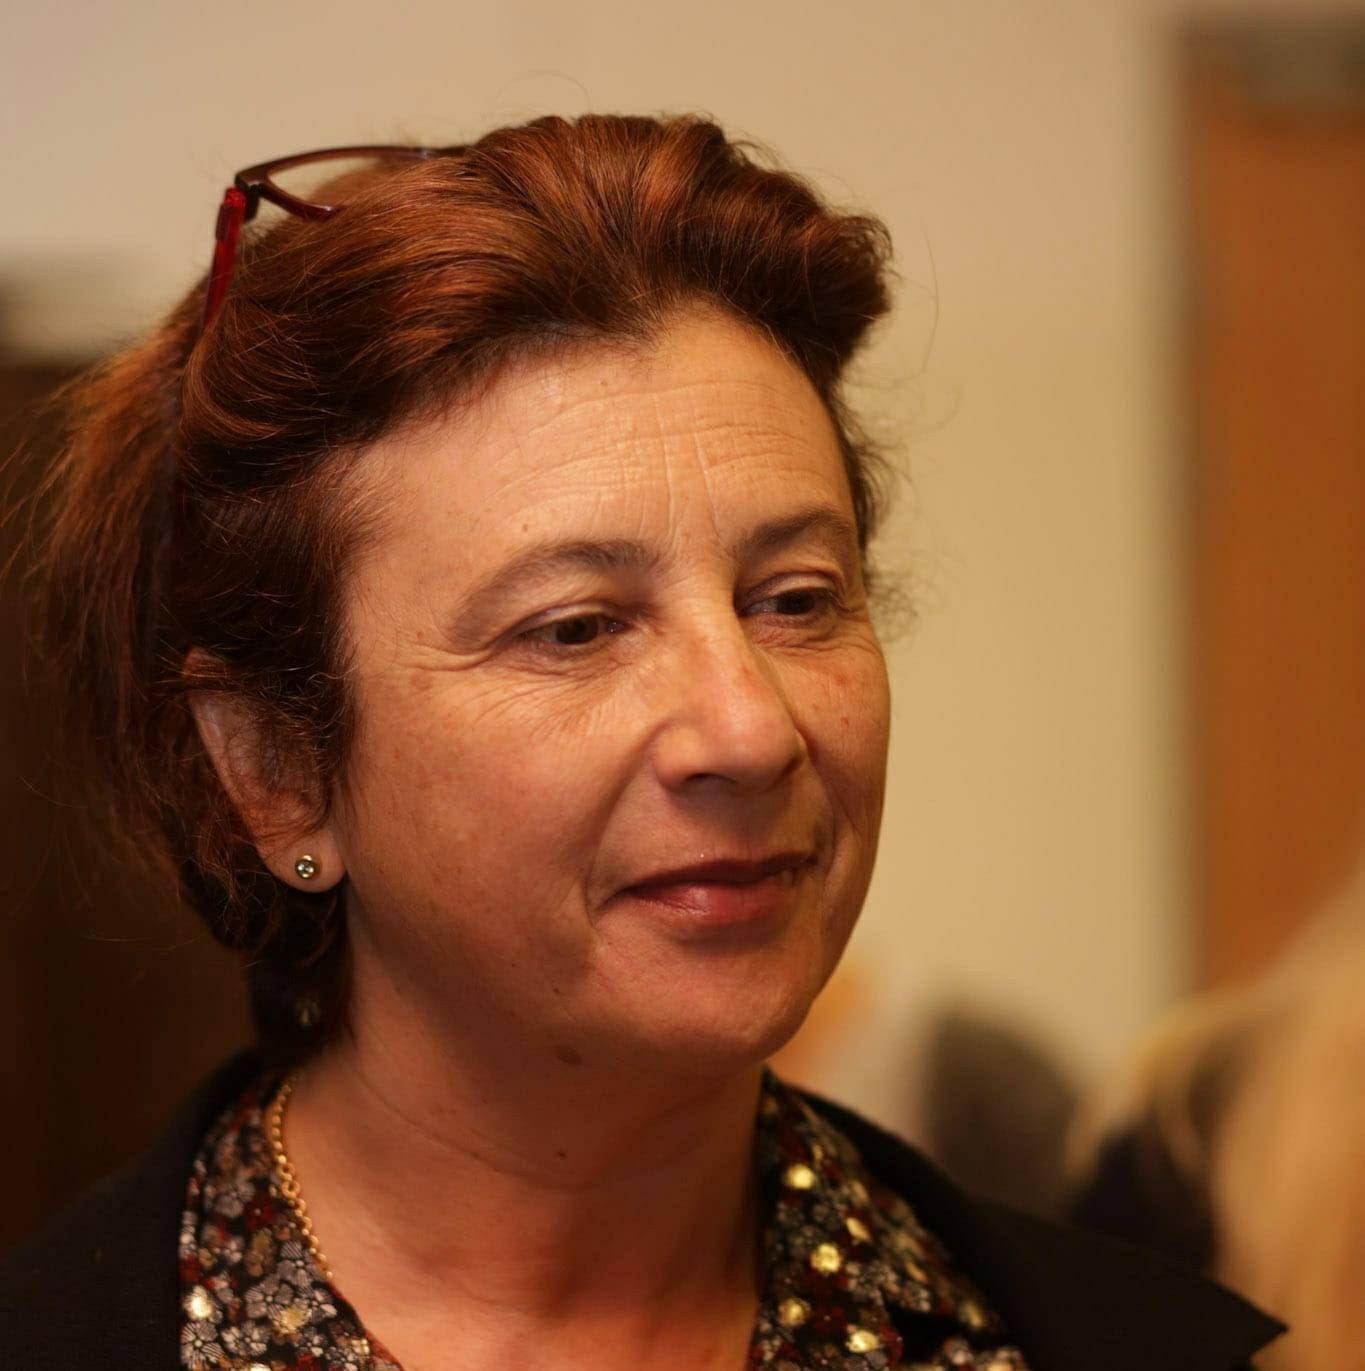 Emmanuelle d'Andrea